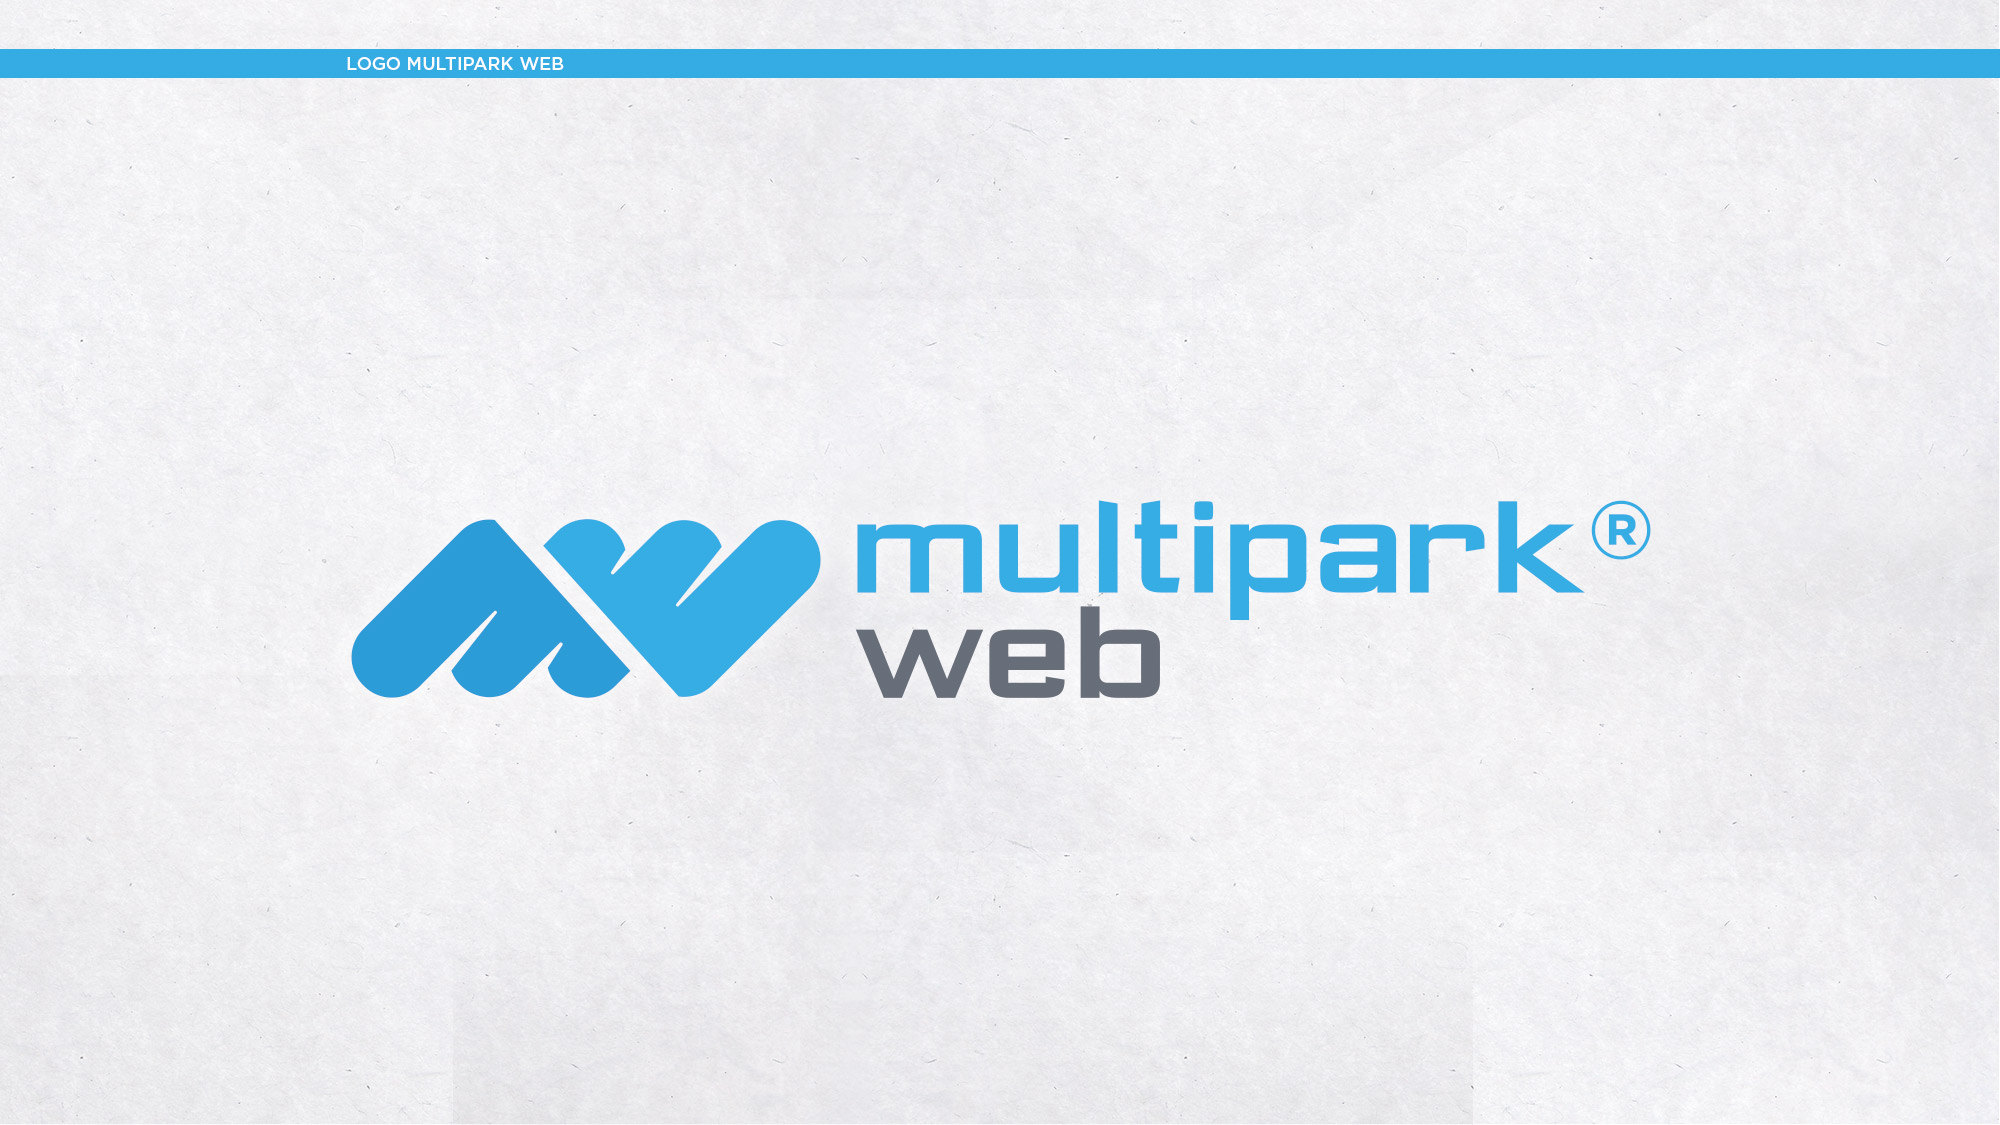 MultiparkWeb_Rea_Logo1.jpg